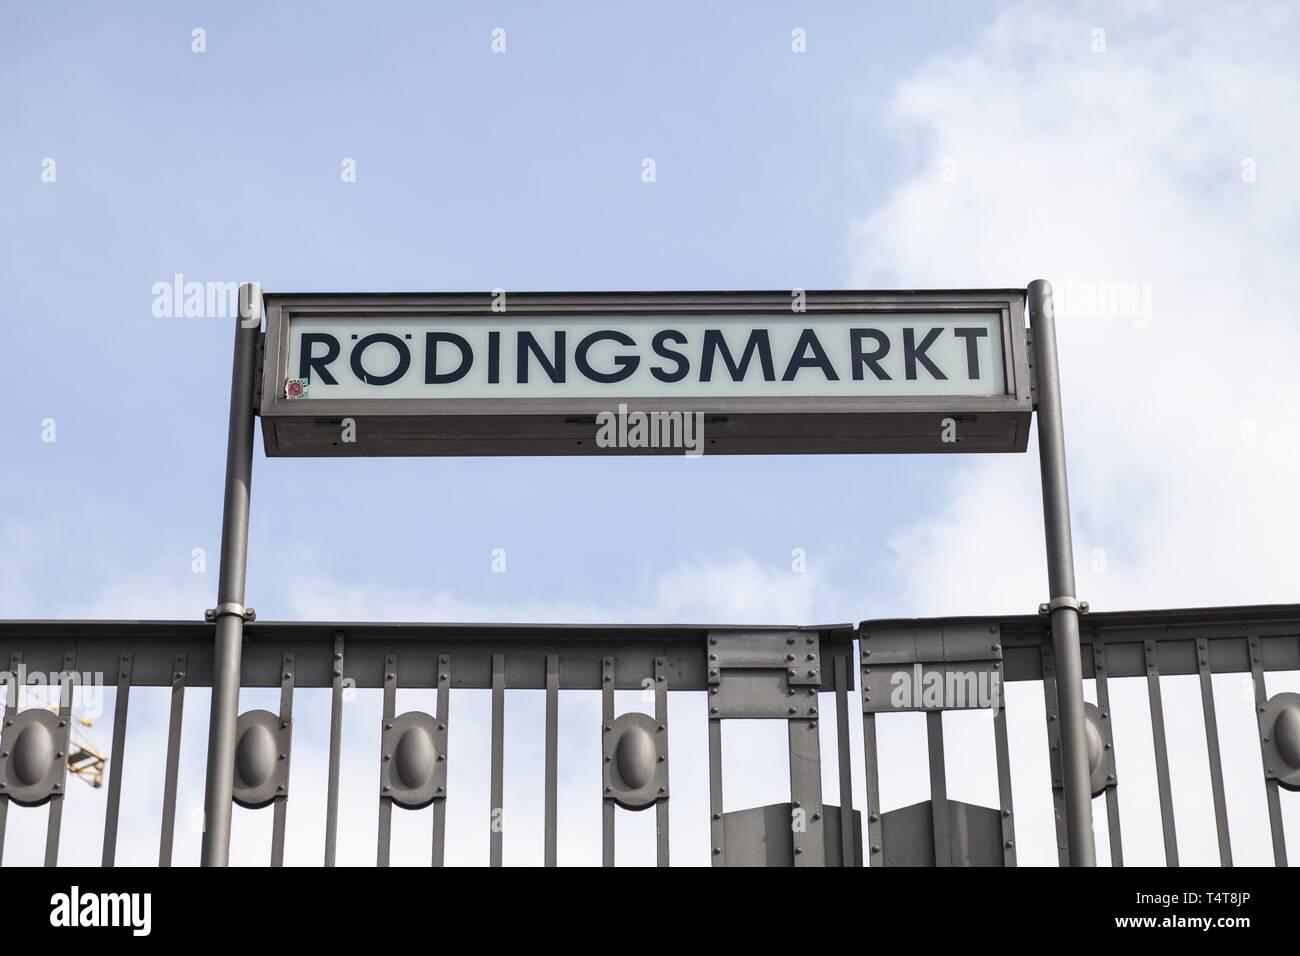 Metro sign, Rödingsmarkt, Hamburg, Germany, Europe - Stock Image